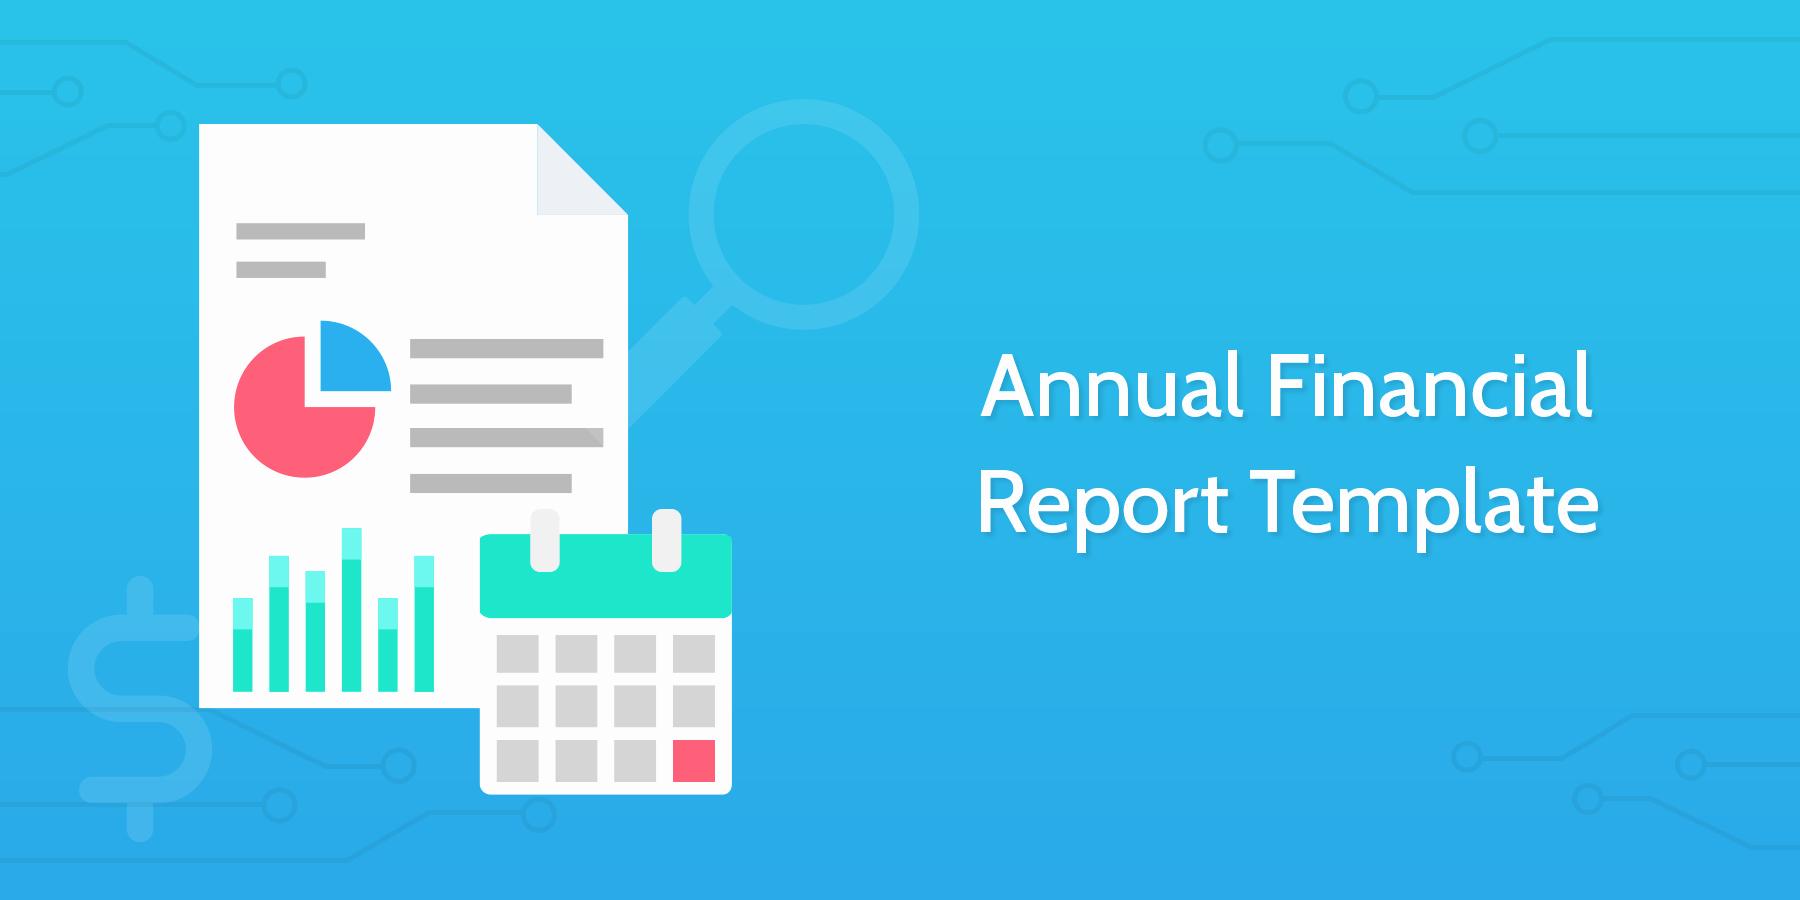 Annual Financial Report Template Fresh Annual Financial Report Template